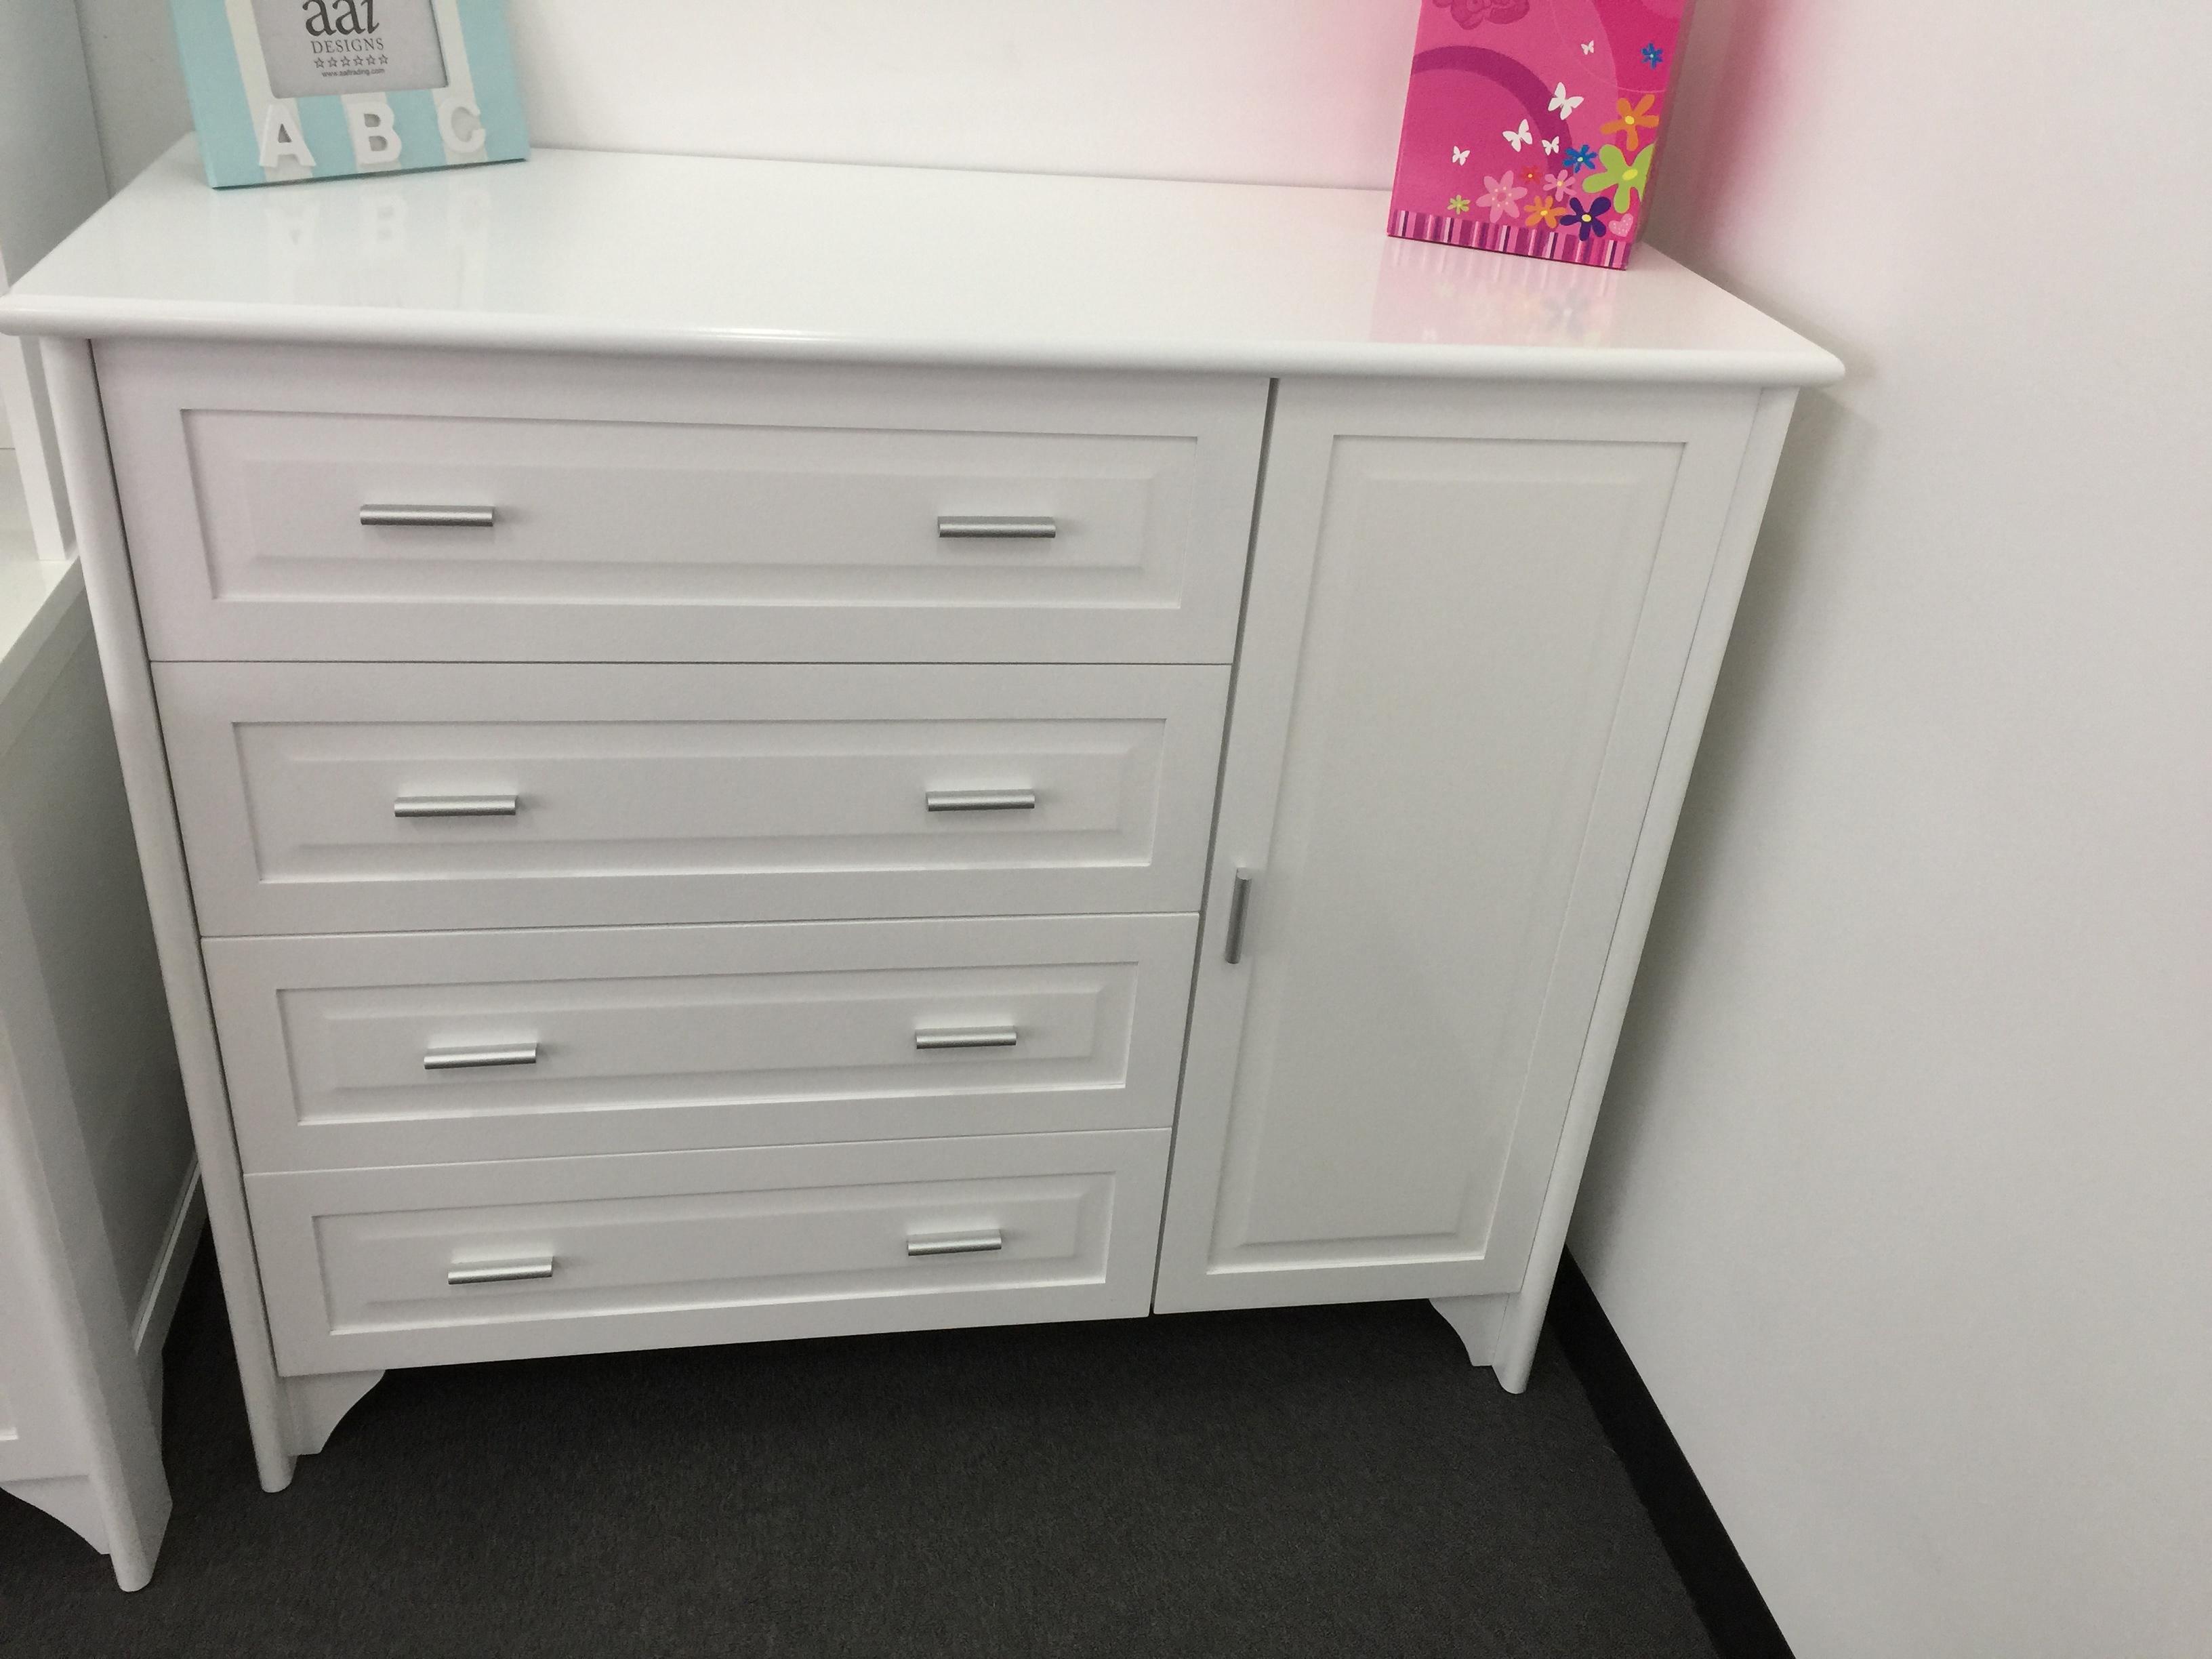 dresser jordon u201cnursery chestu201d dresser with 4 drawers + cabinet - white TCCWVXL